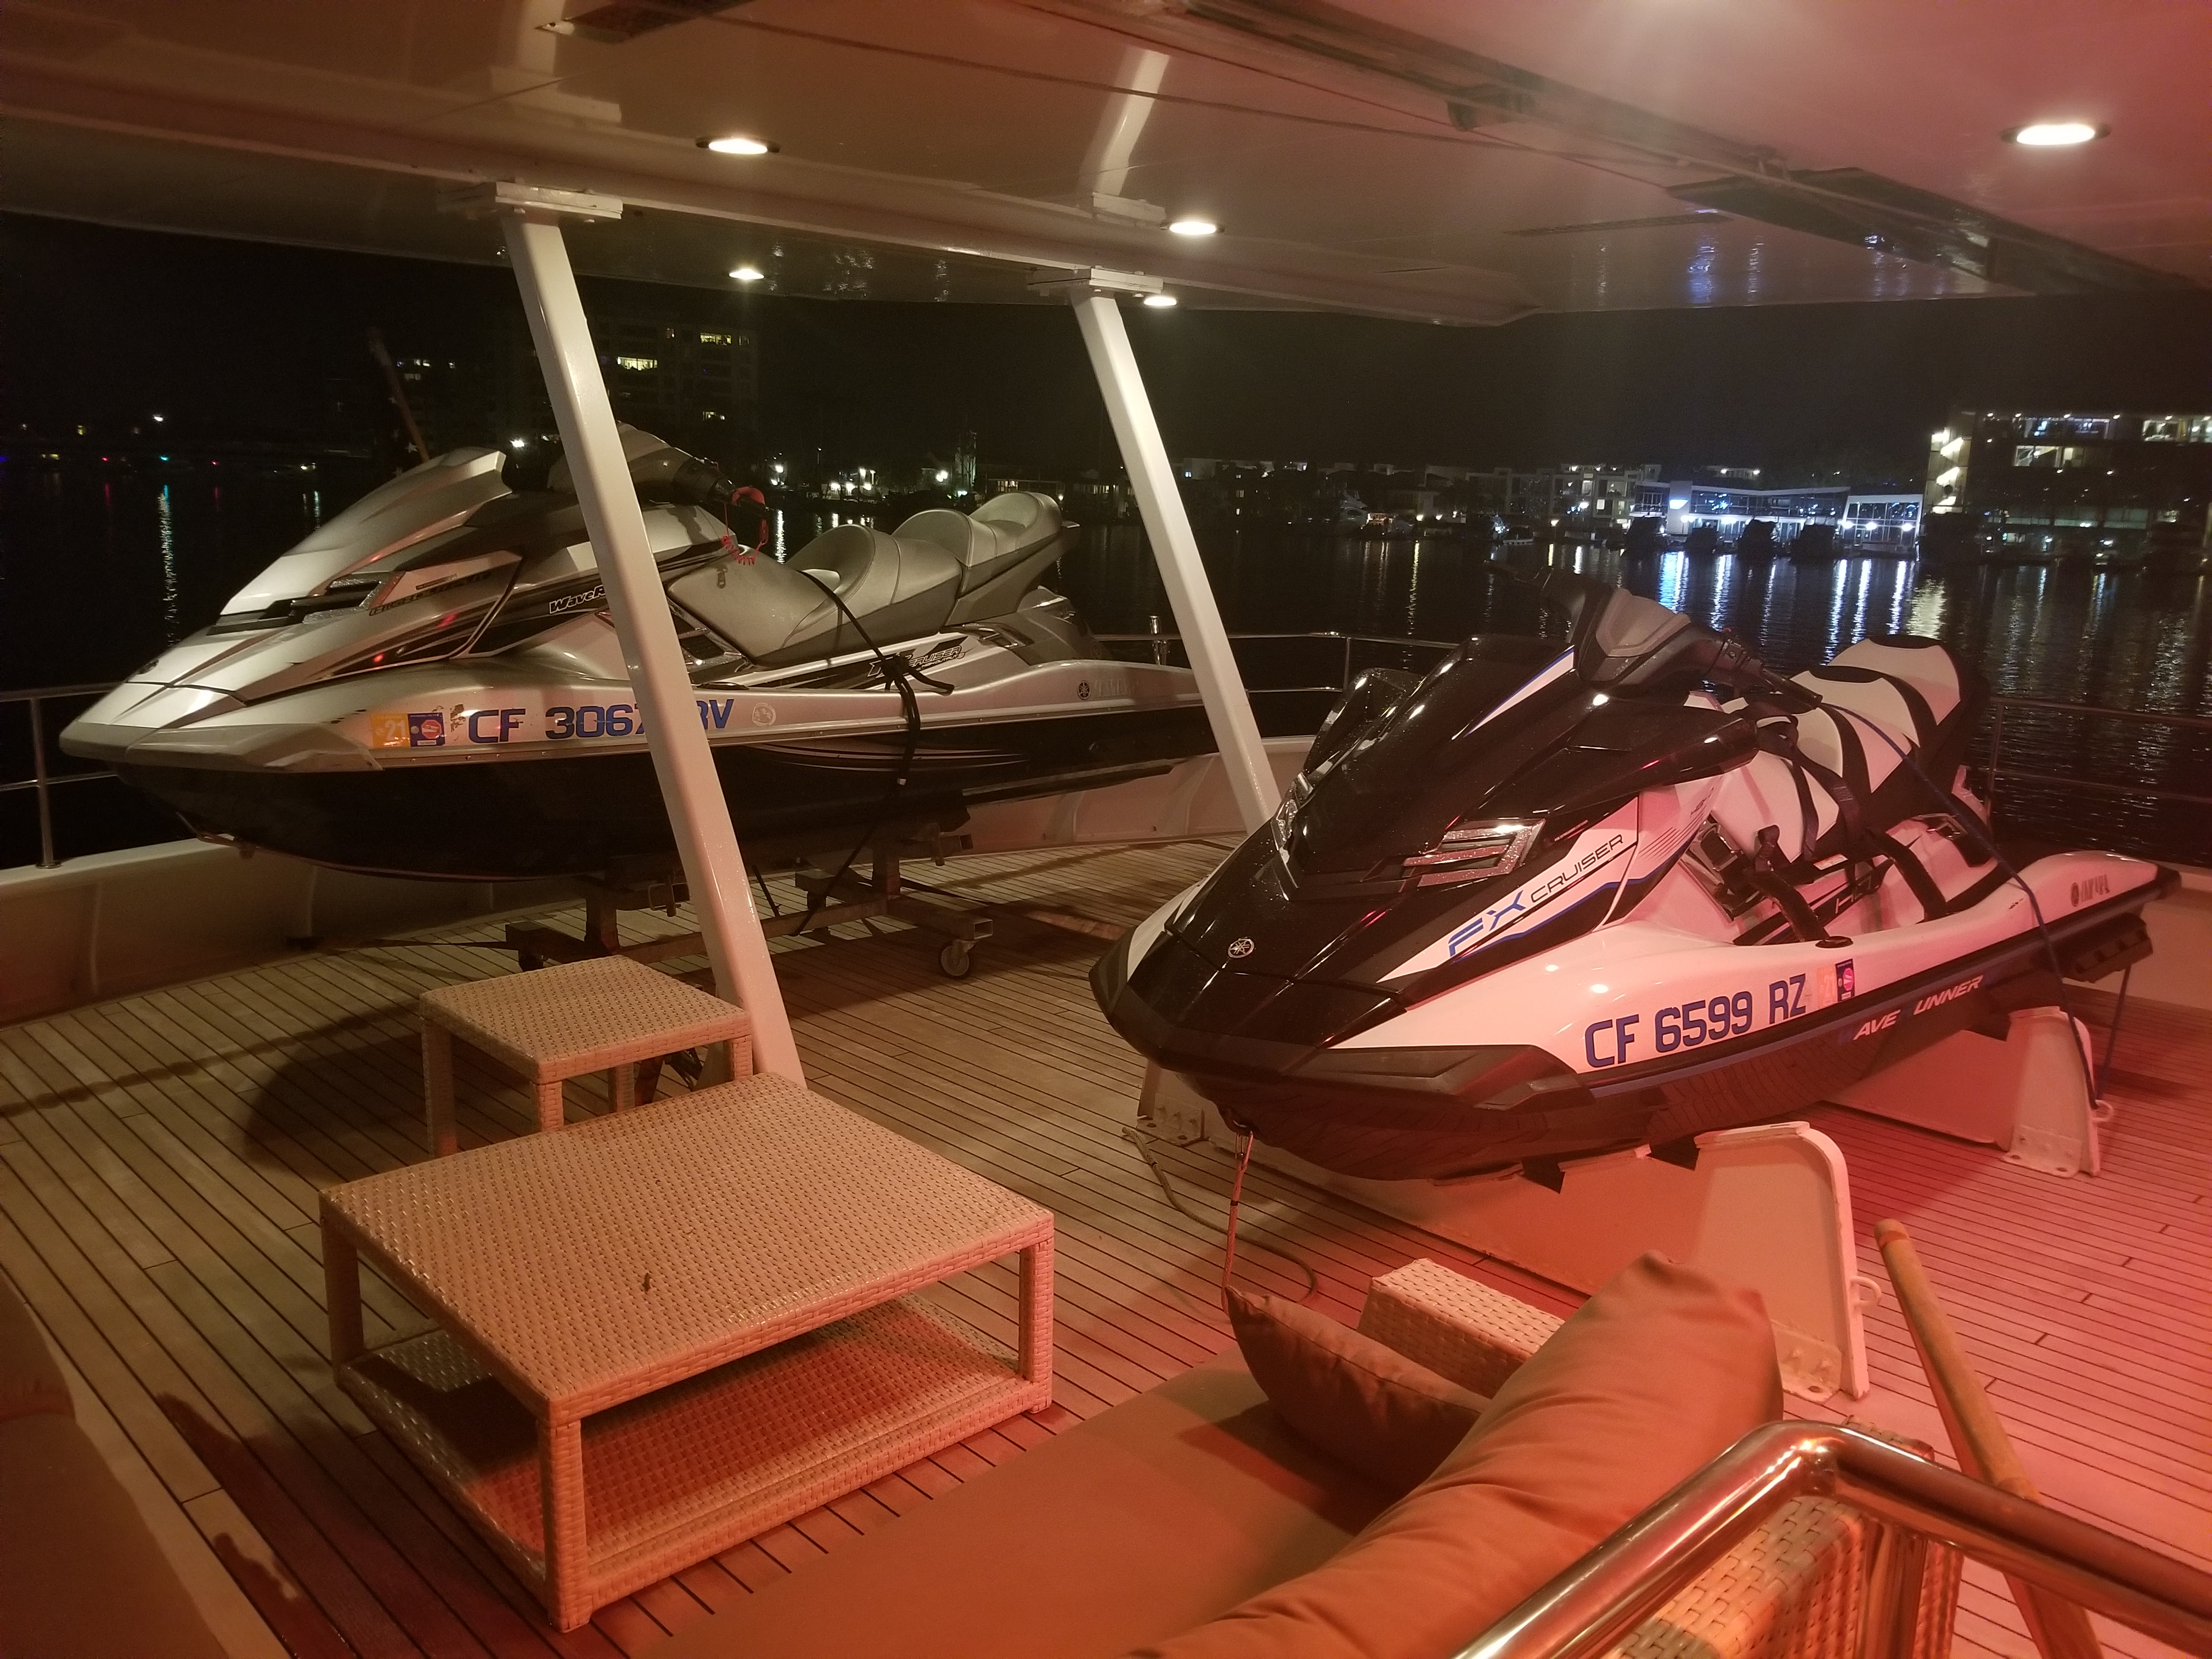 Star Jet Skis2